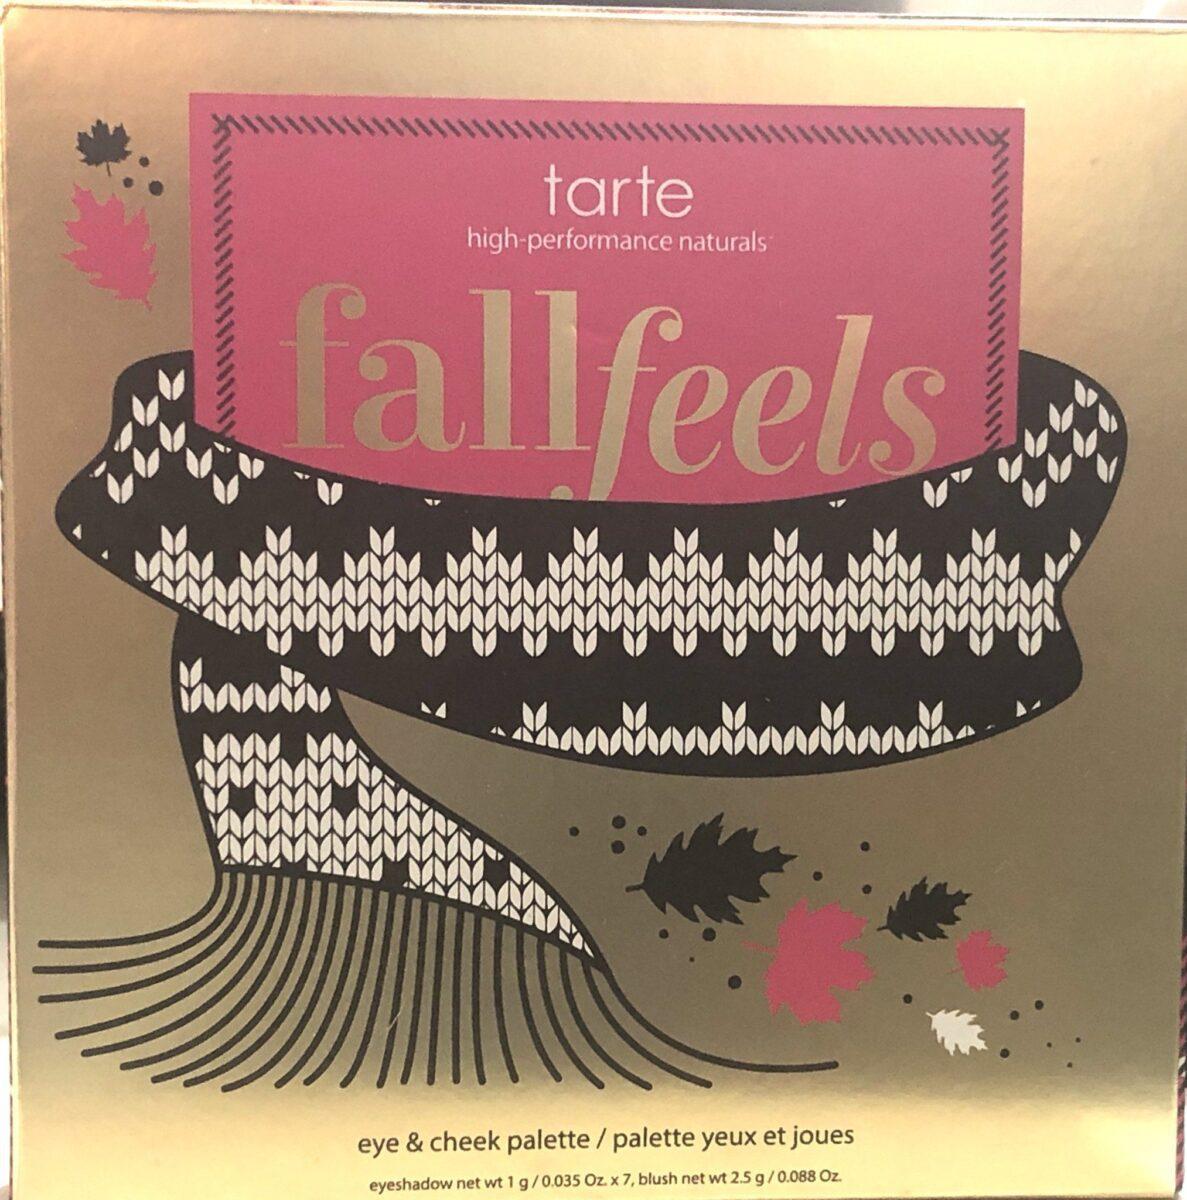 TARTE FALL FEELS OUTER BOX